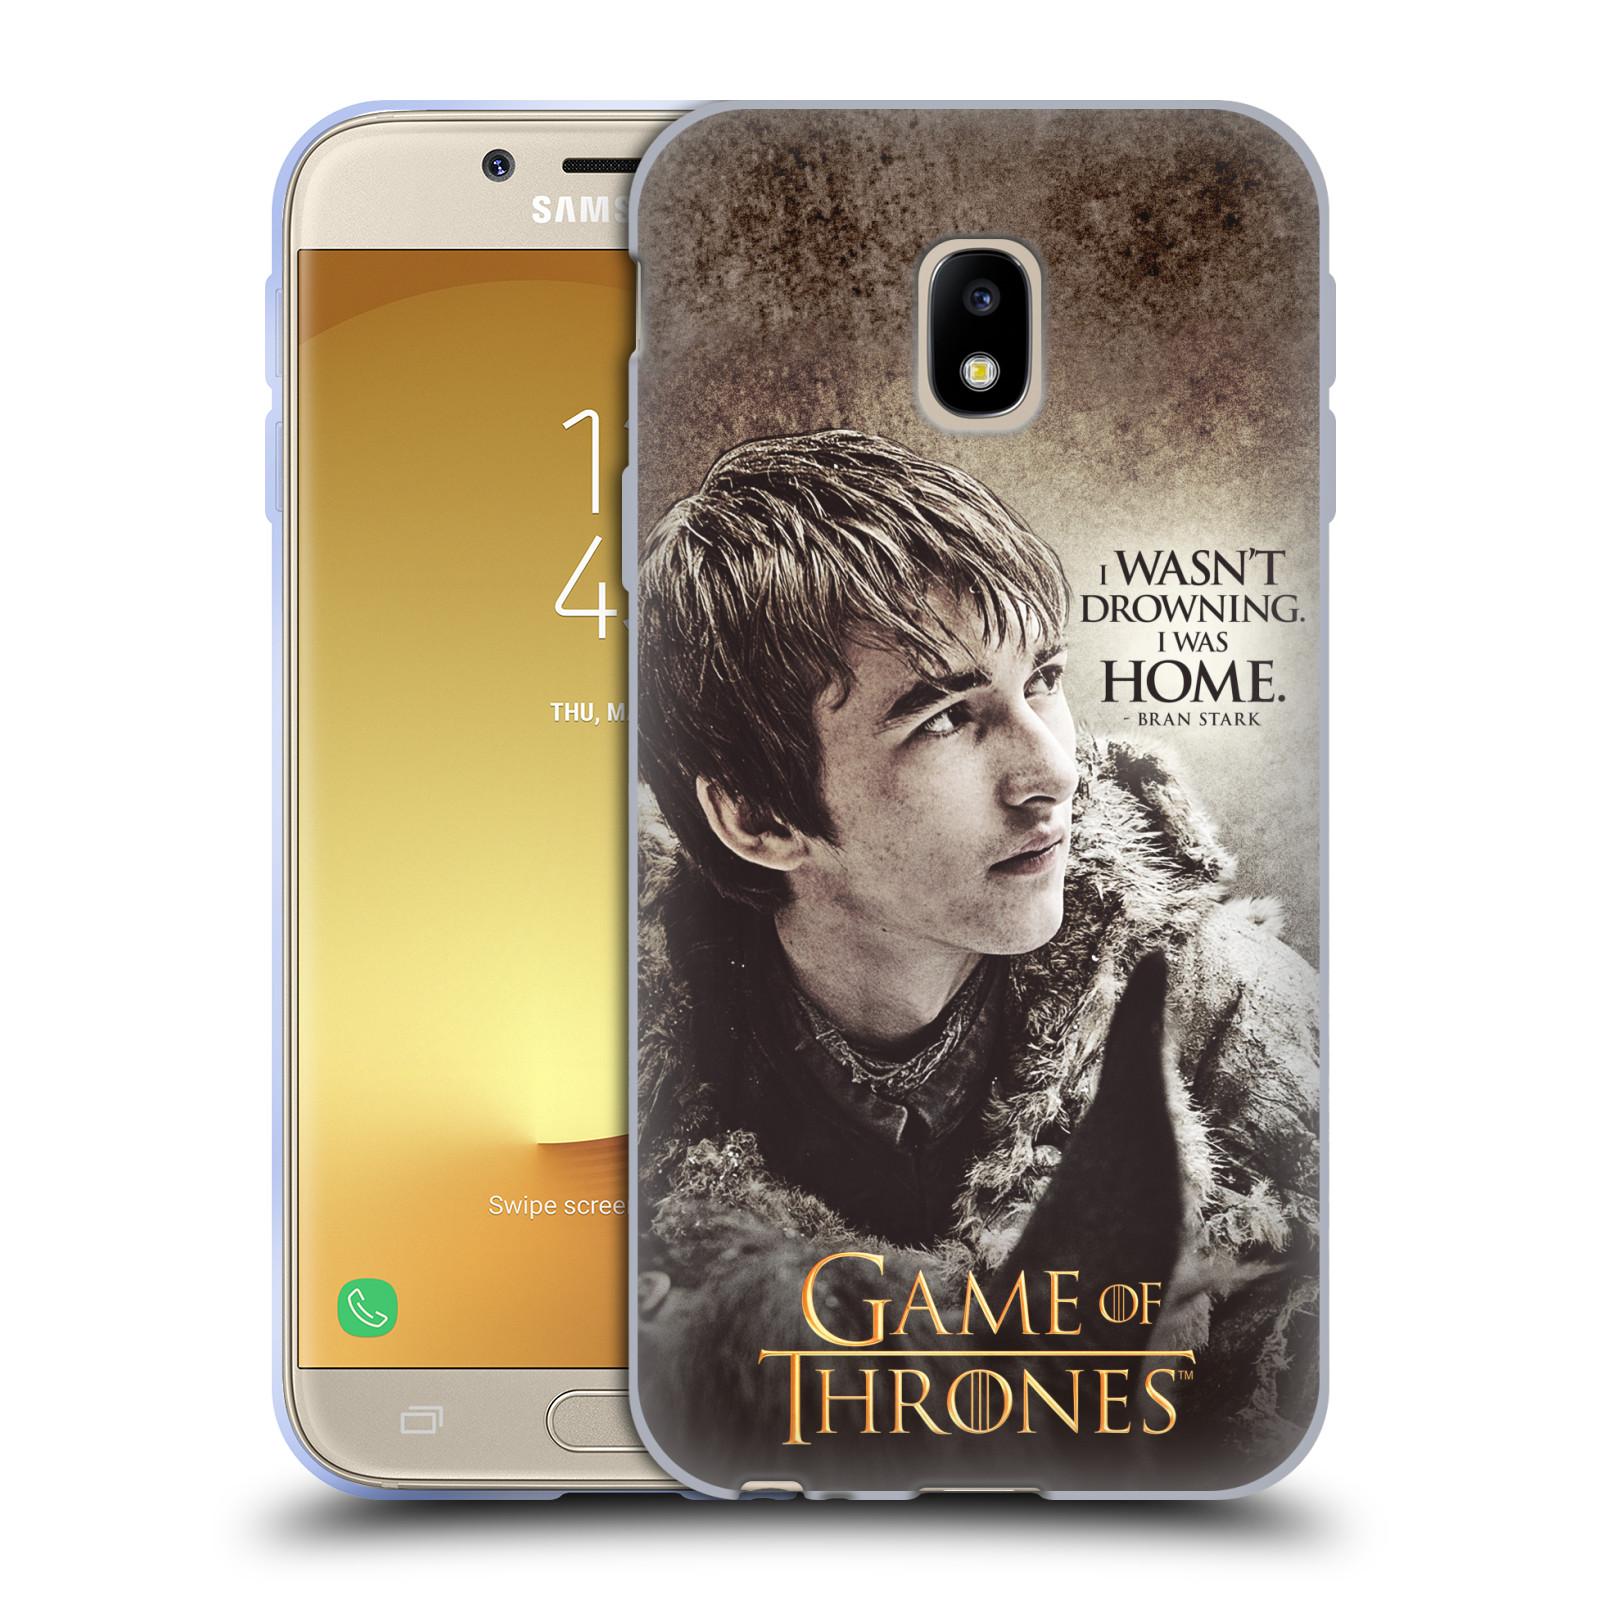 HEAD CASE silikonový obal na mobil Samsung Galaxy J3 2017 (J330, J330F) oficiální kryt Hra o trůny Bran Stark